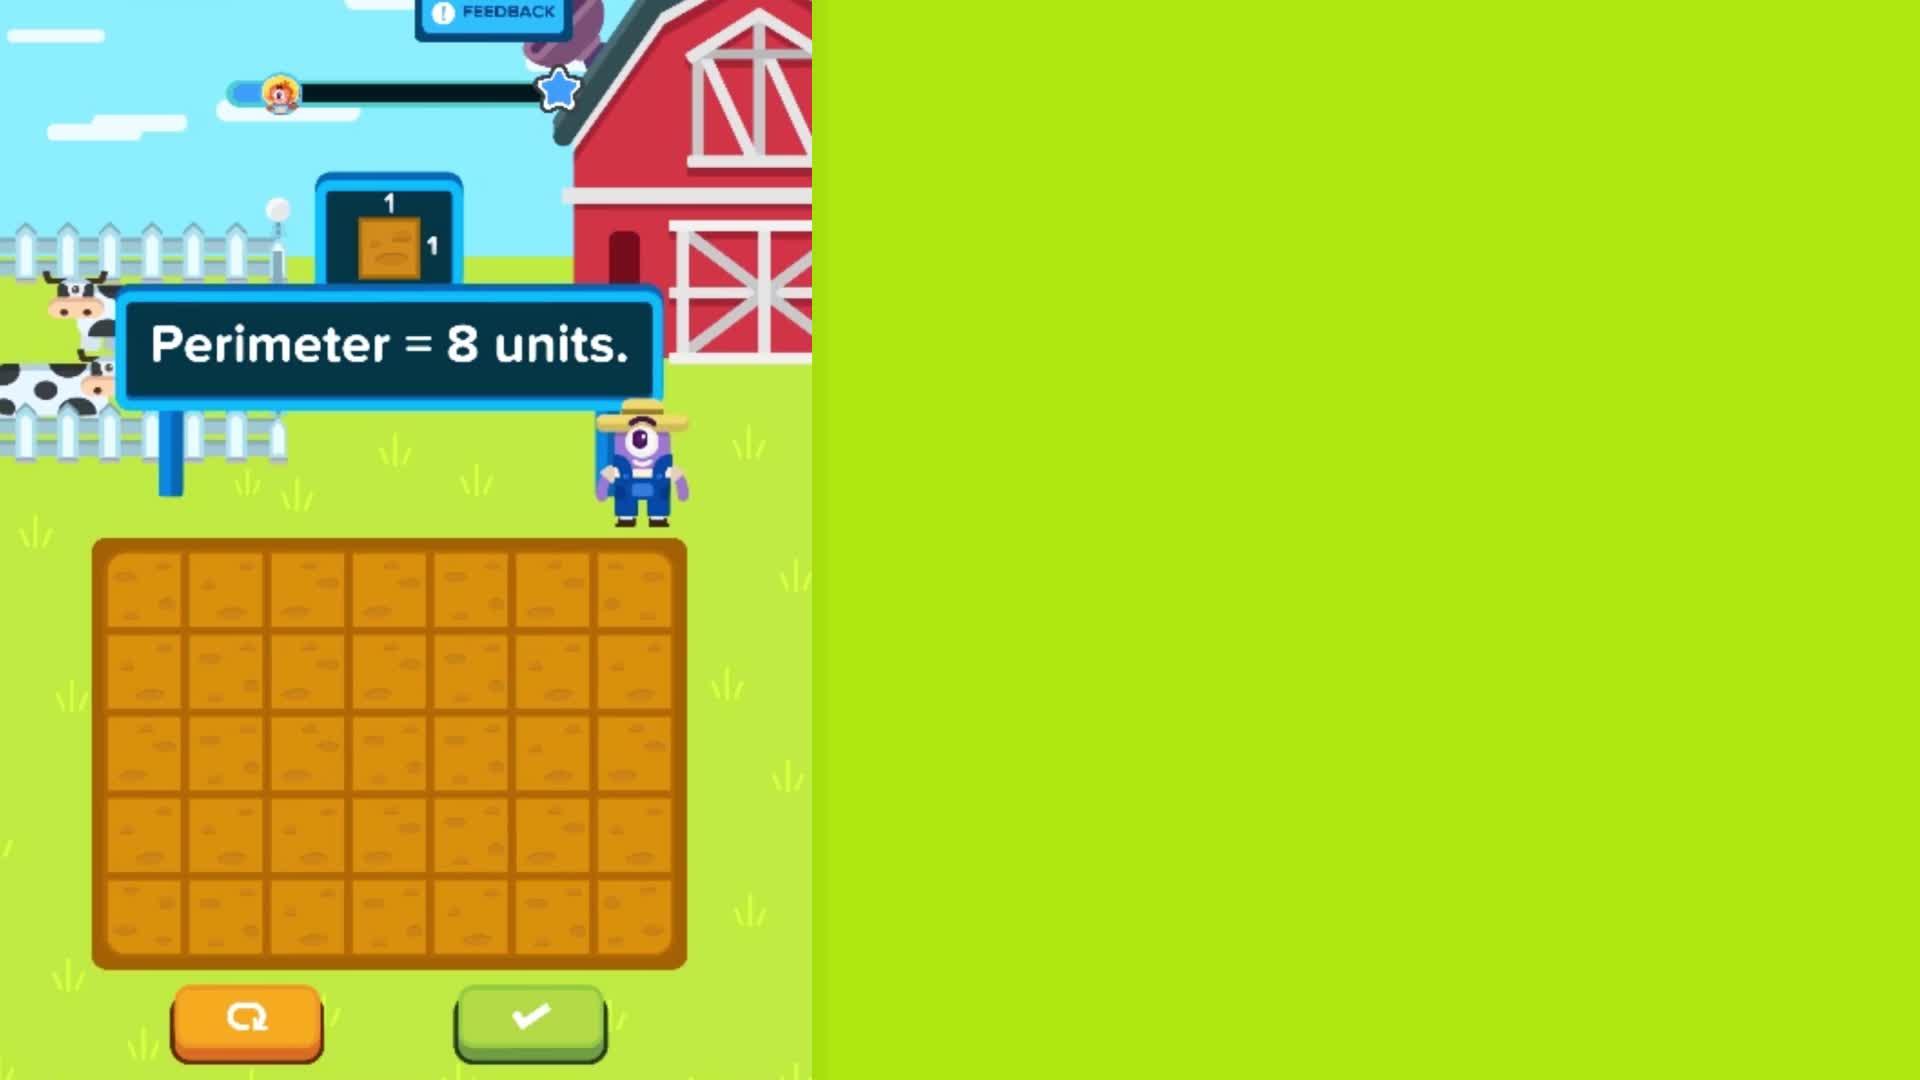 Fency Farm level 2 - Area and Perimeter